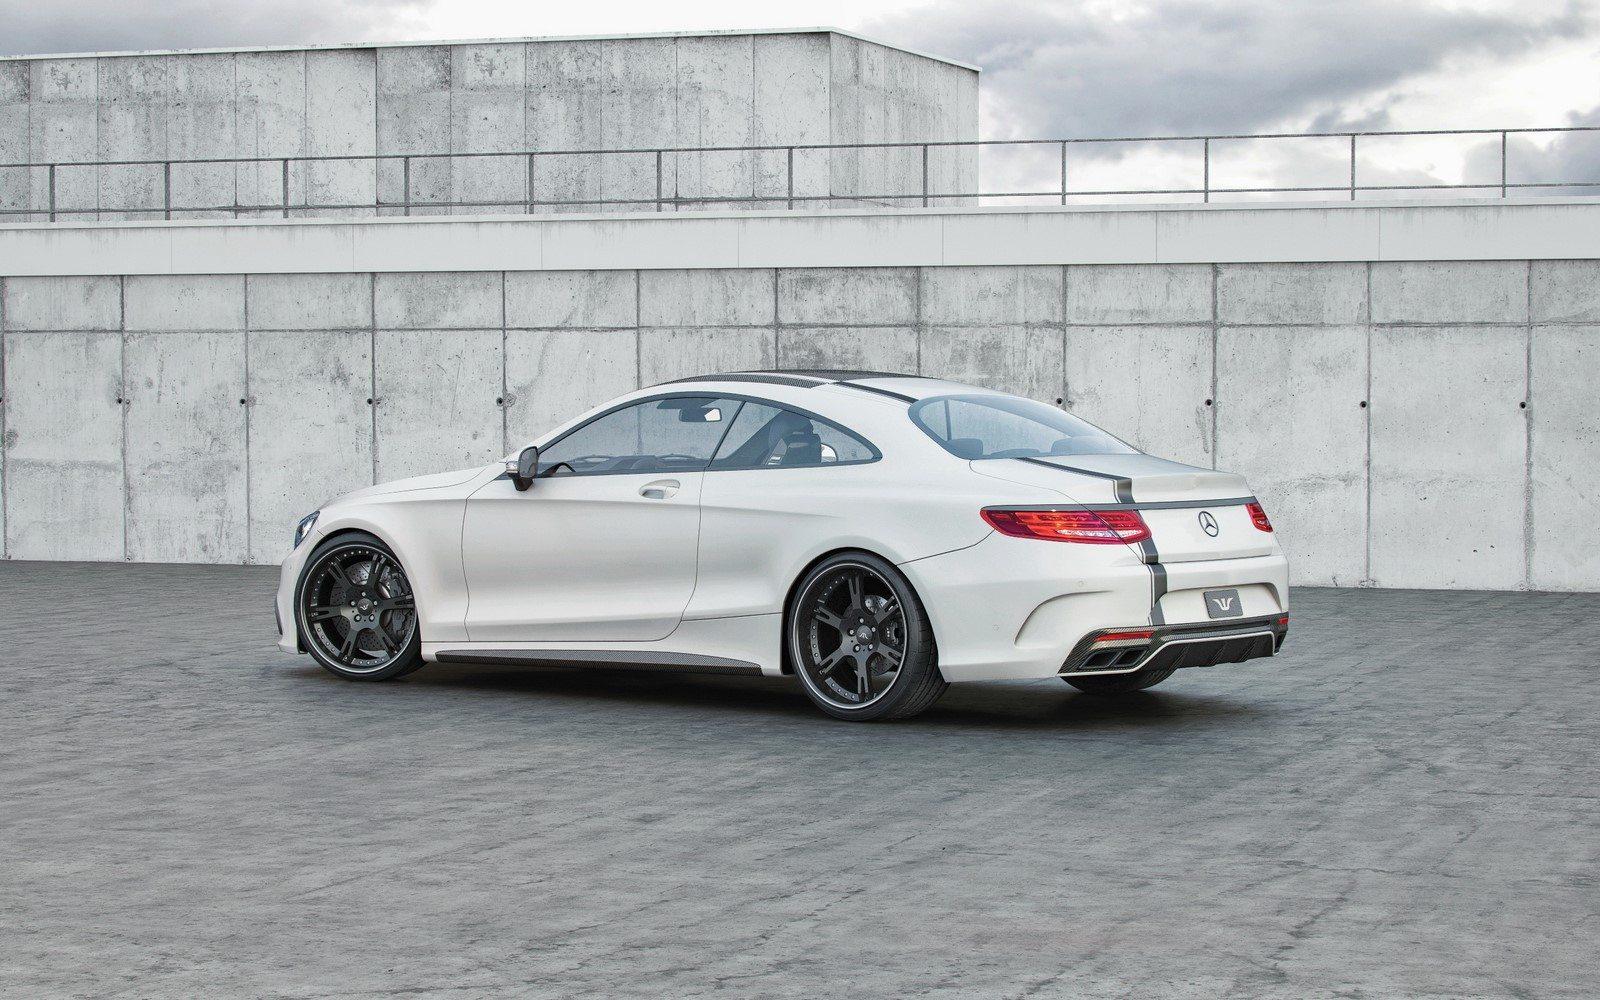 Wheelsandmore Mercedes-Benz S63 AMG Coupé